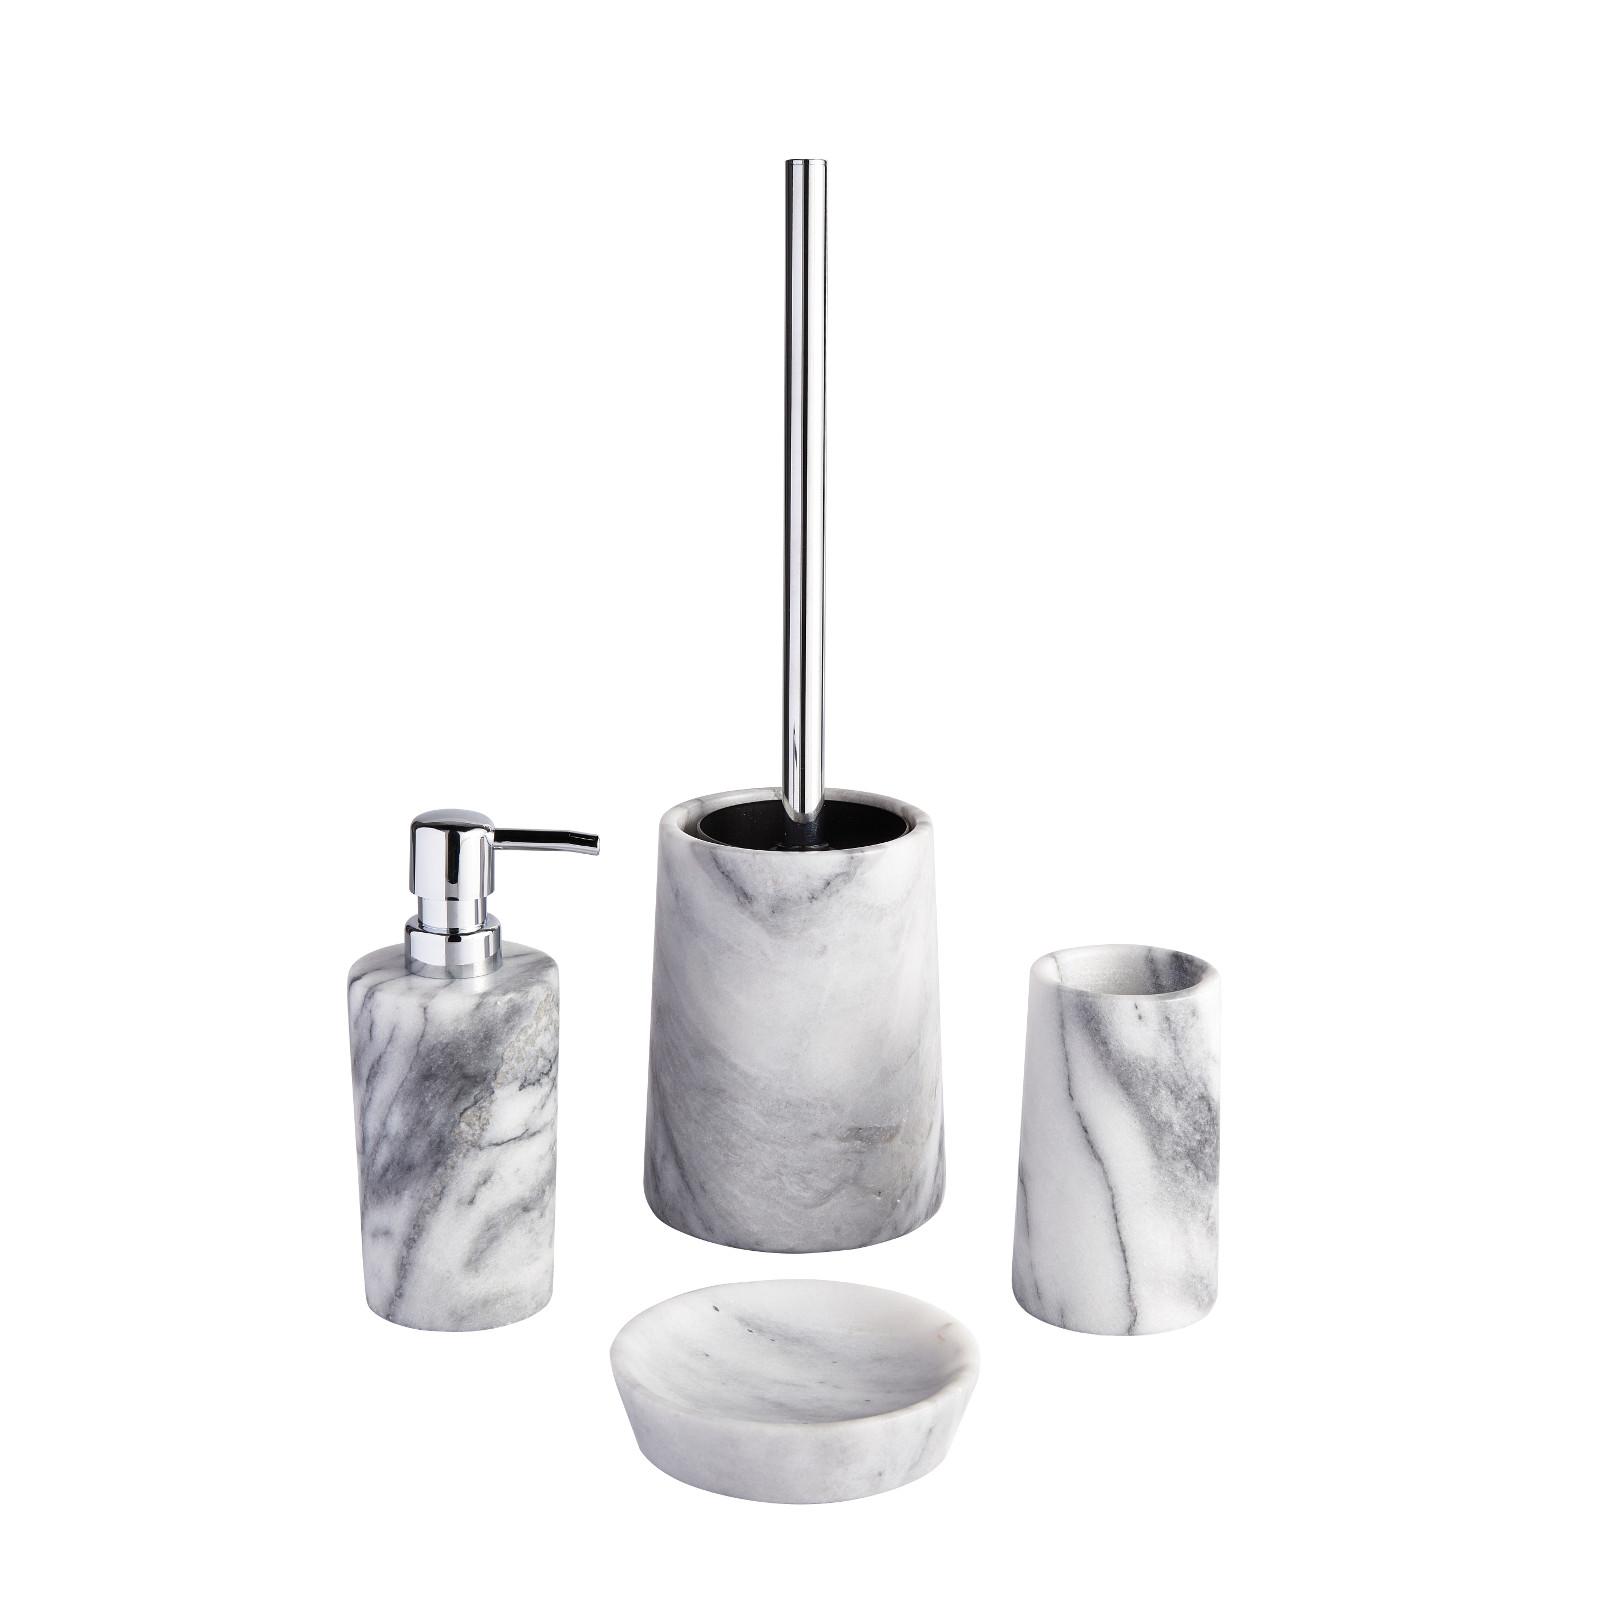 Buy Athena Bathroom Accessory Set 1 Back2bath